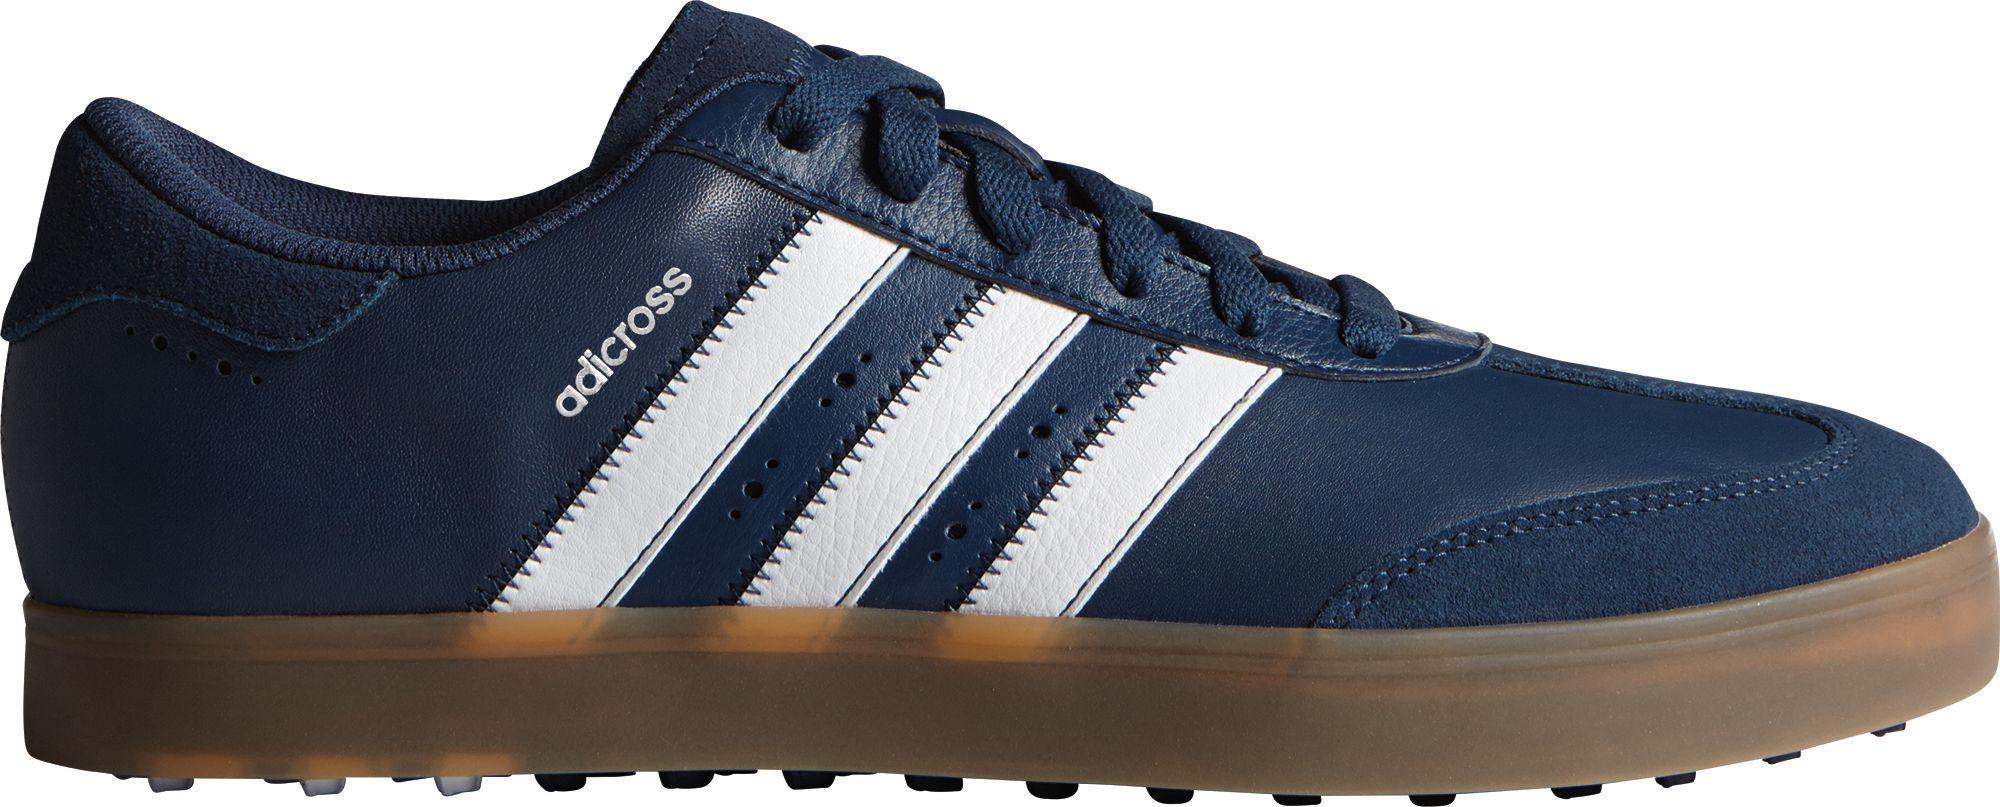 Adidas adicross V zapatos de golf golf Galaxy